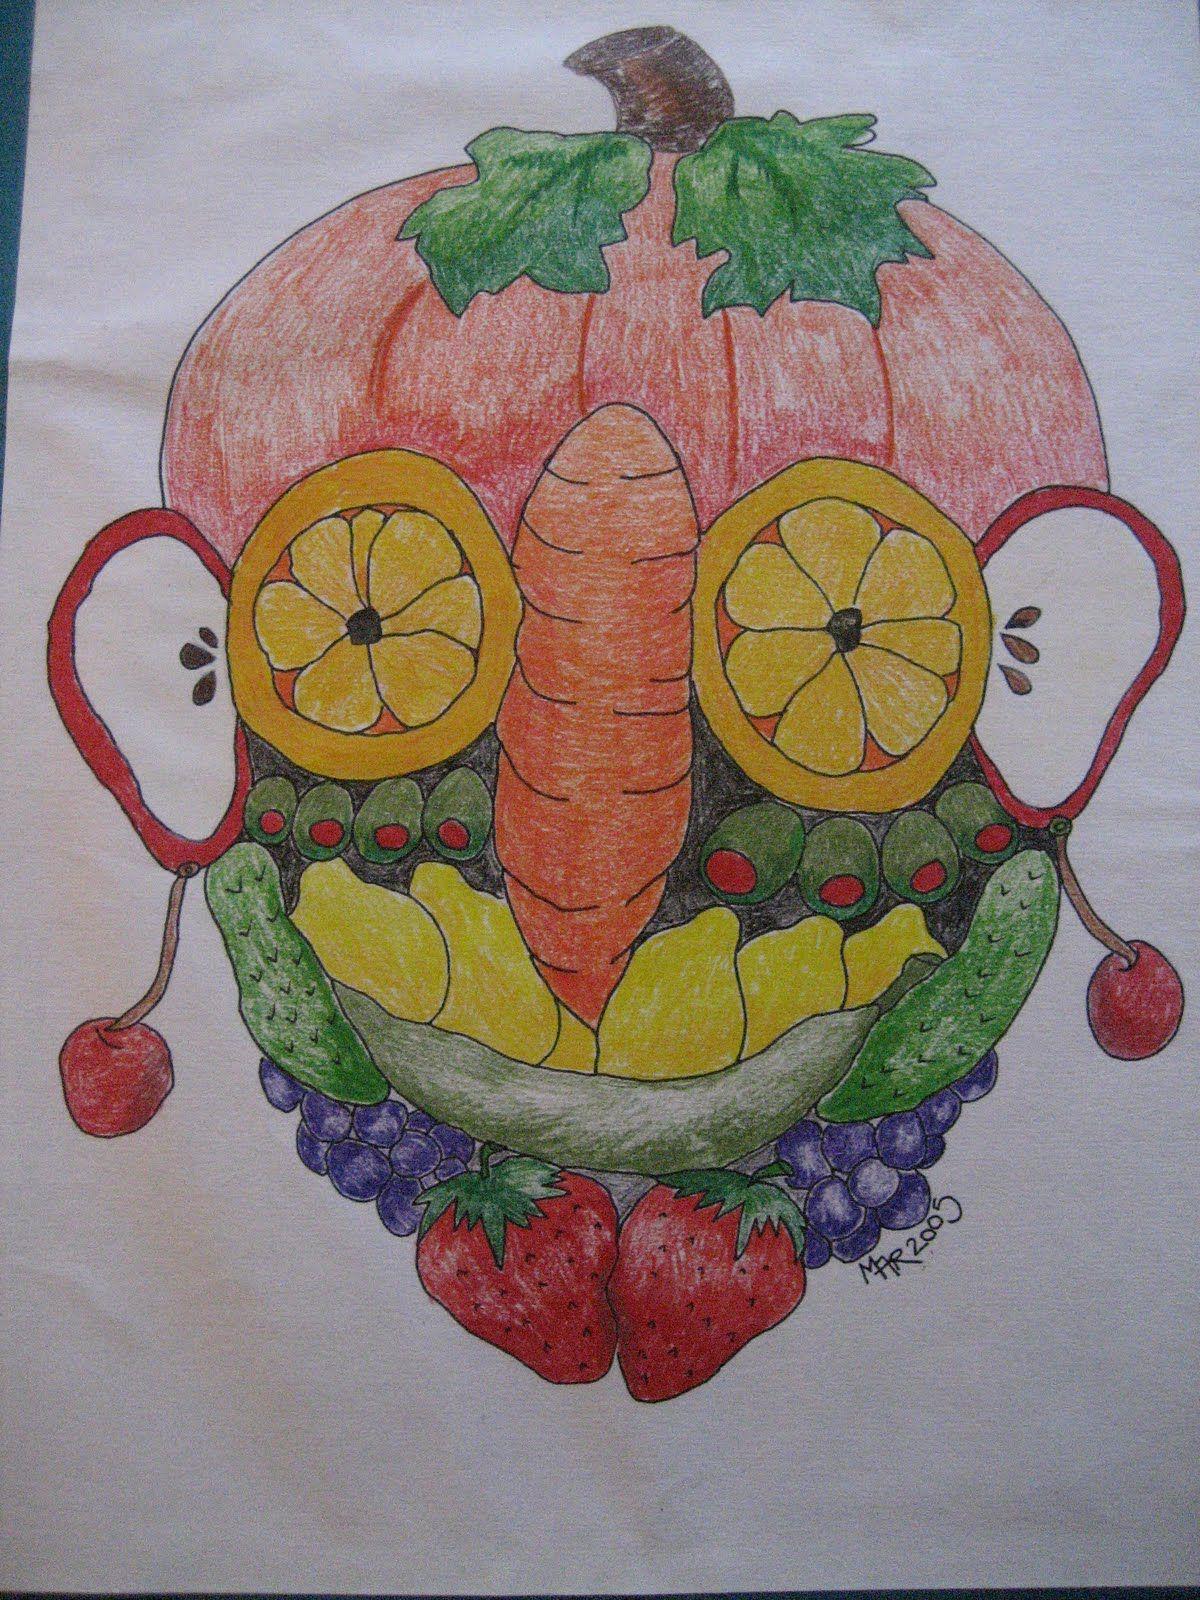 Giuseppe Arcimboldo Kids Printable - Google Art Lesson Ideas Lessons Elementary